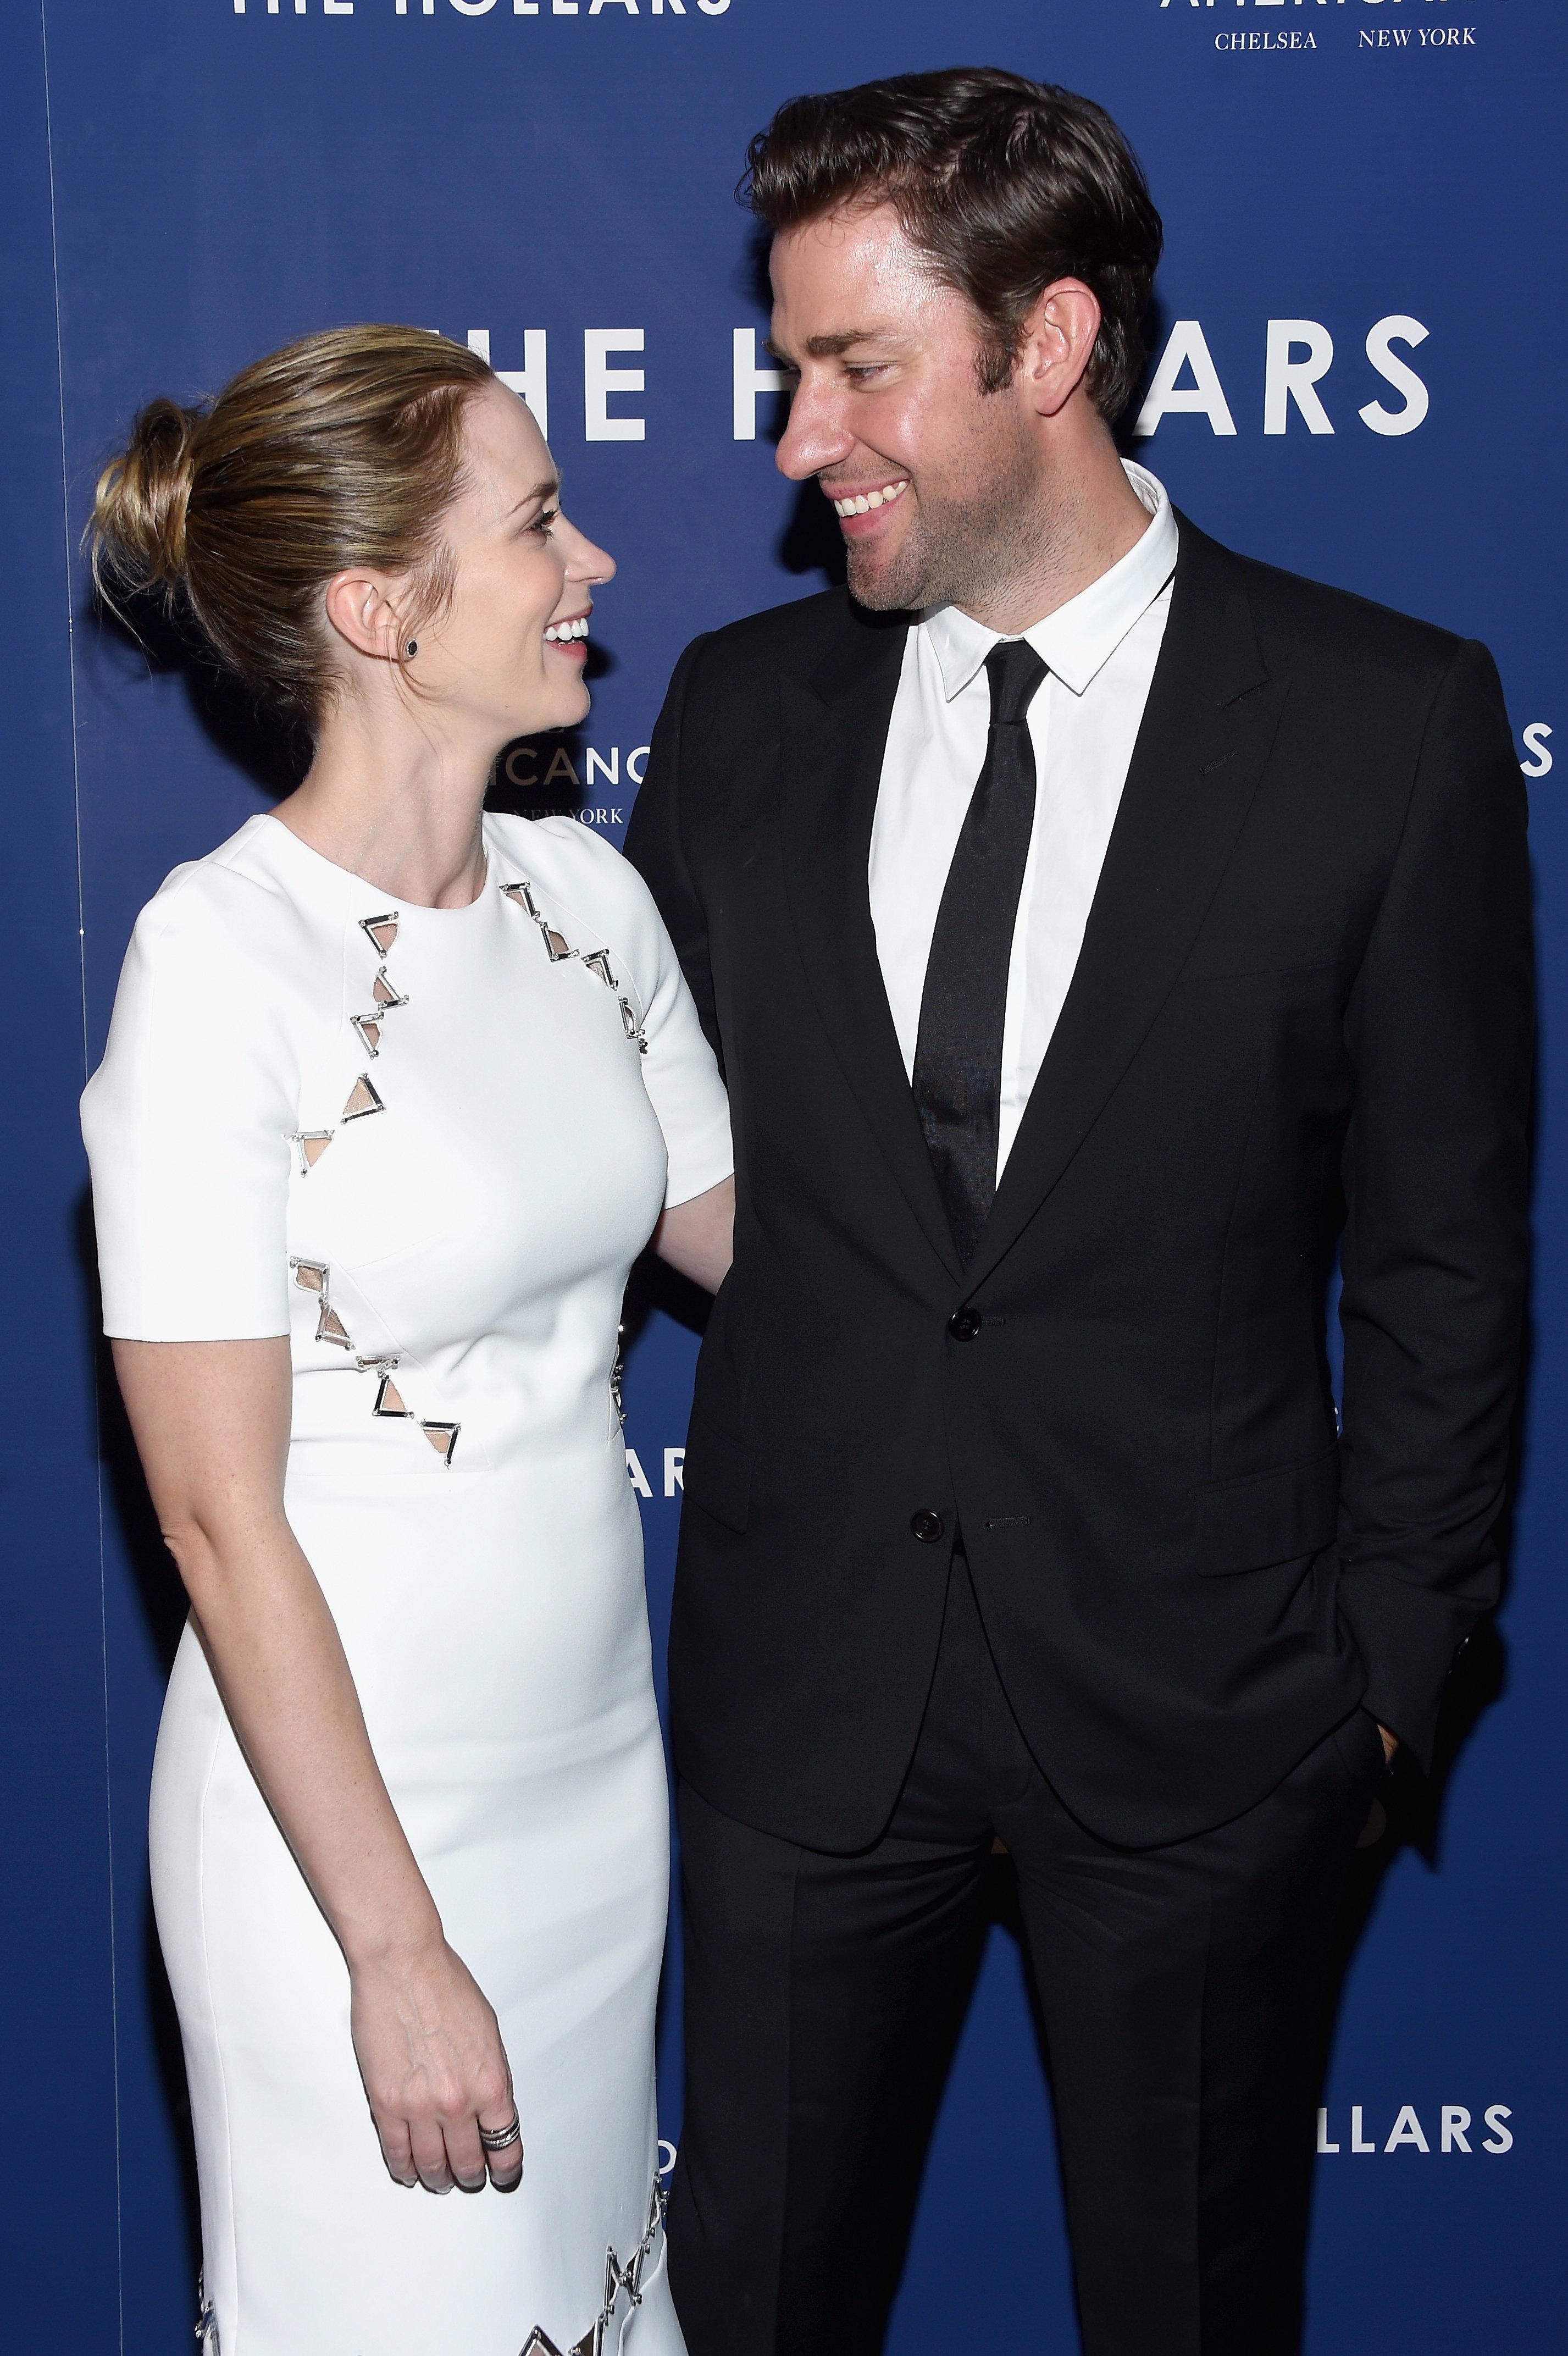 John Krasinski and Emily Bluntare parents to 2-year-old Hazel and 6-month-old Violet.